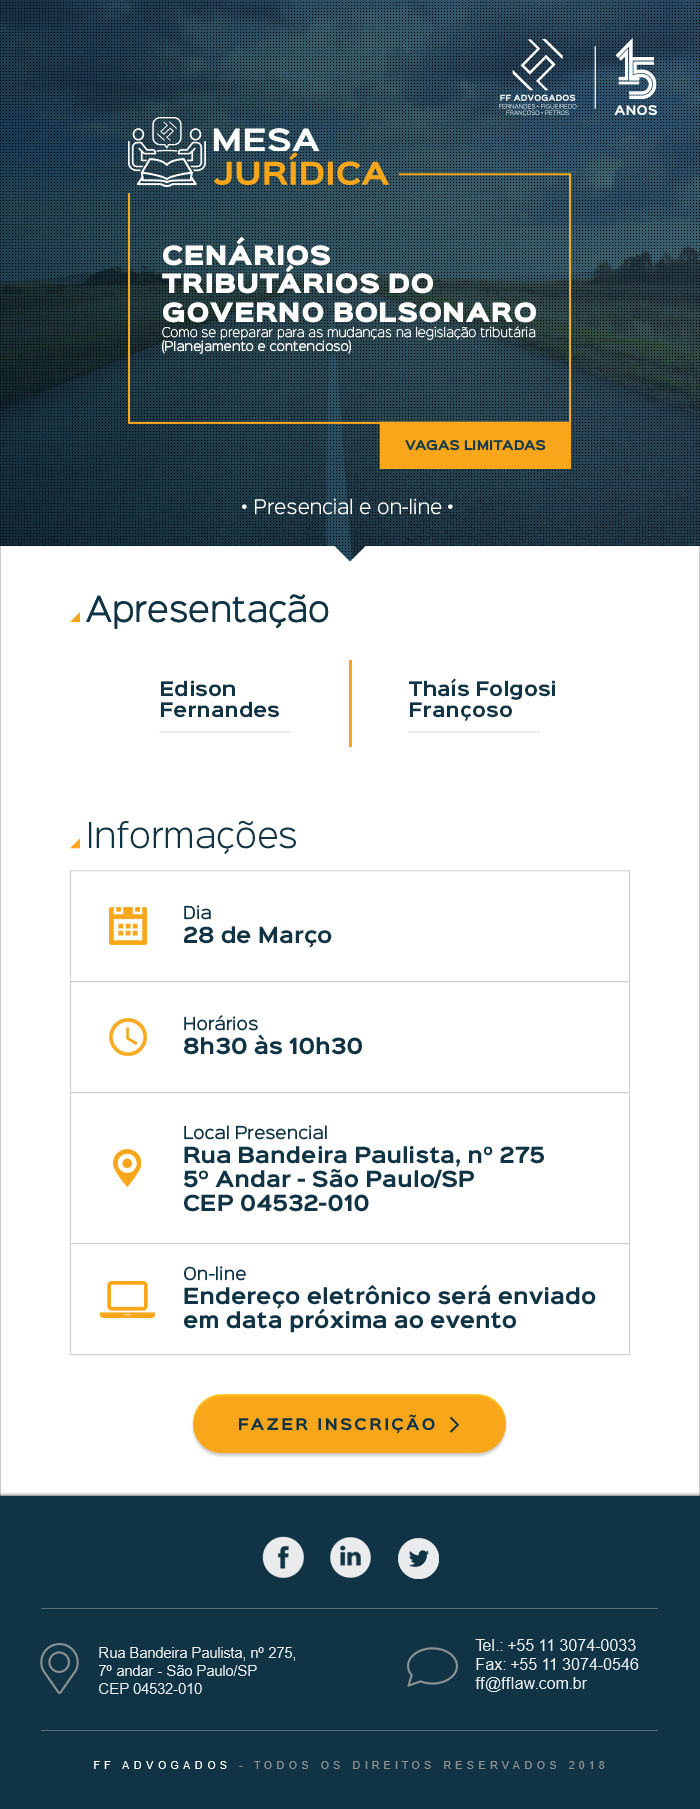 Email_Marketing_-_Mesa_Juridica